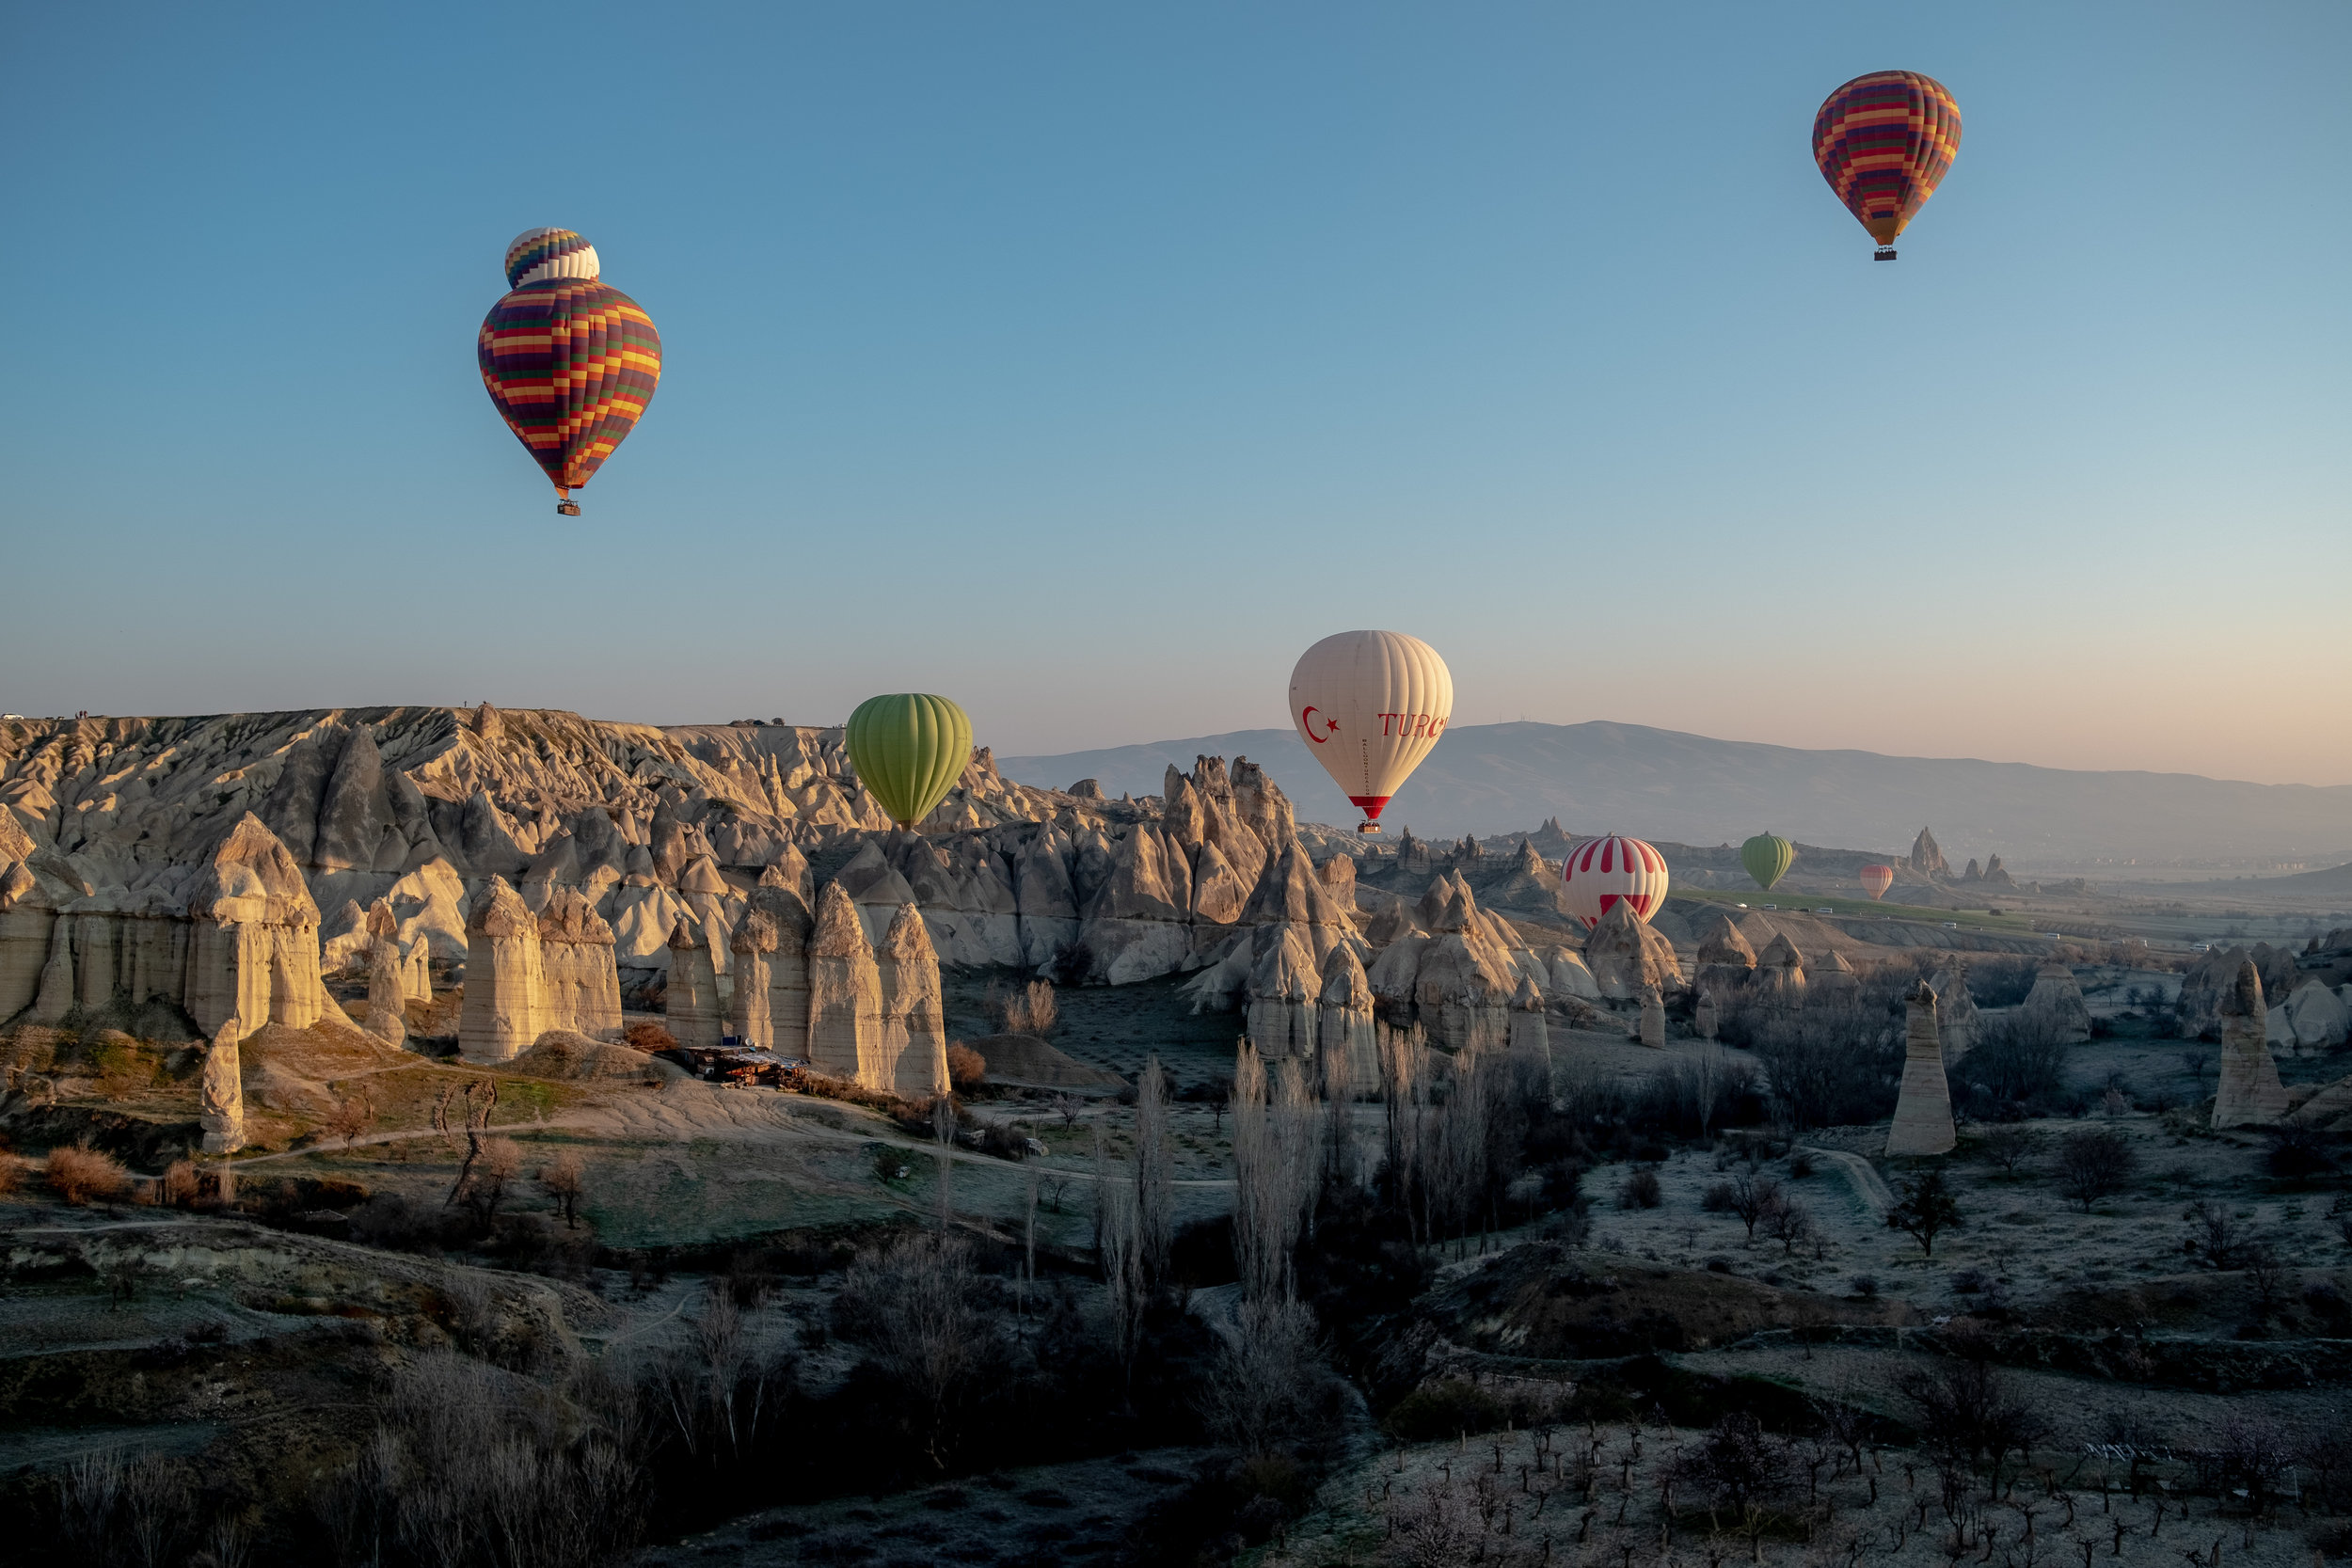 20190404 - Turkey - 0259.JPG